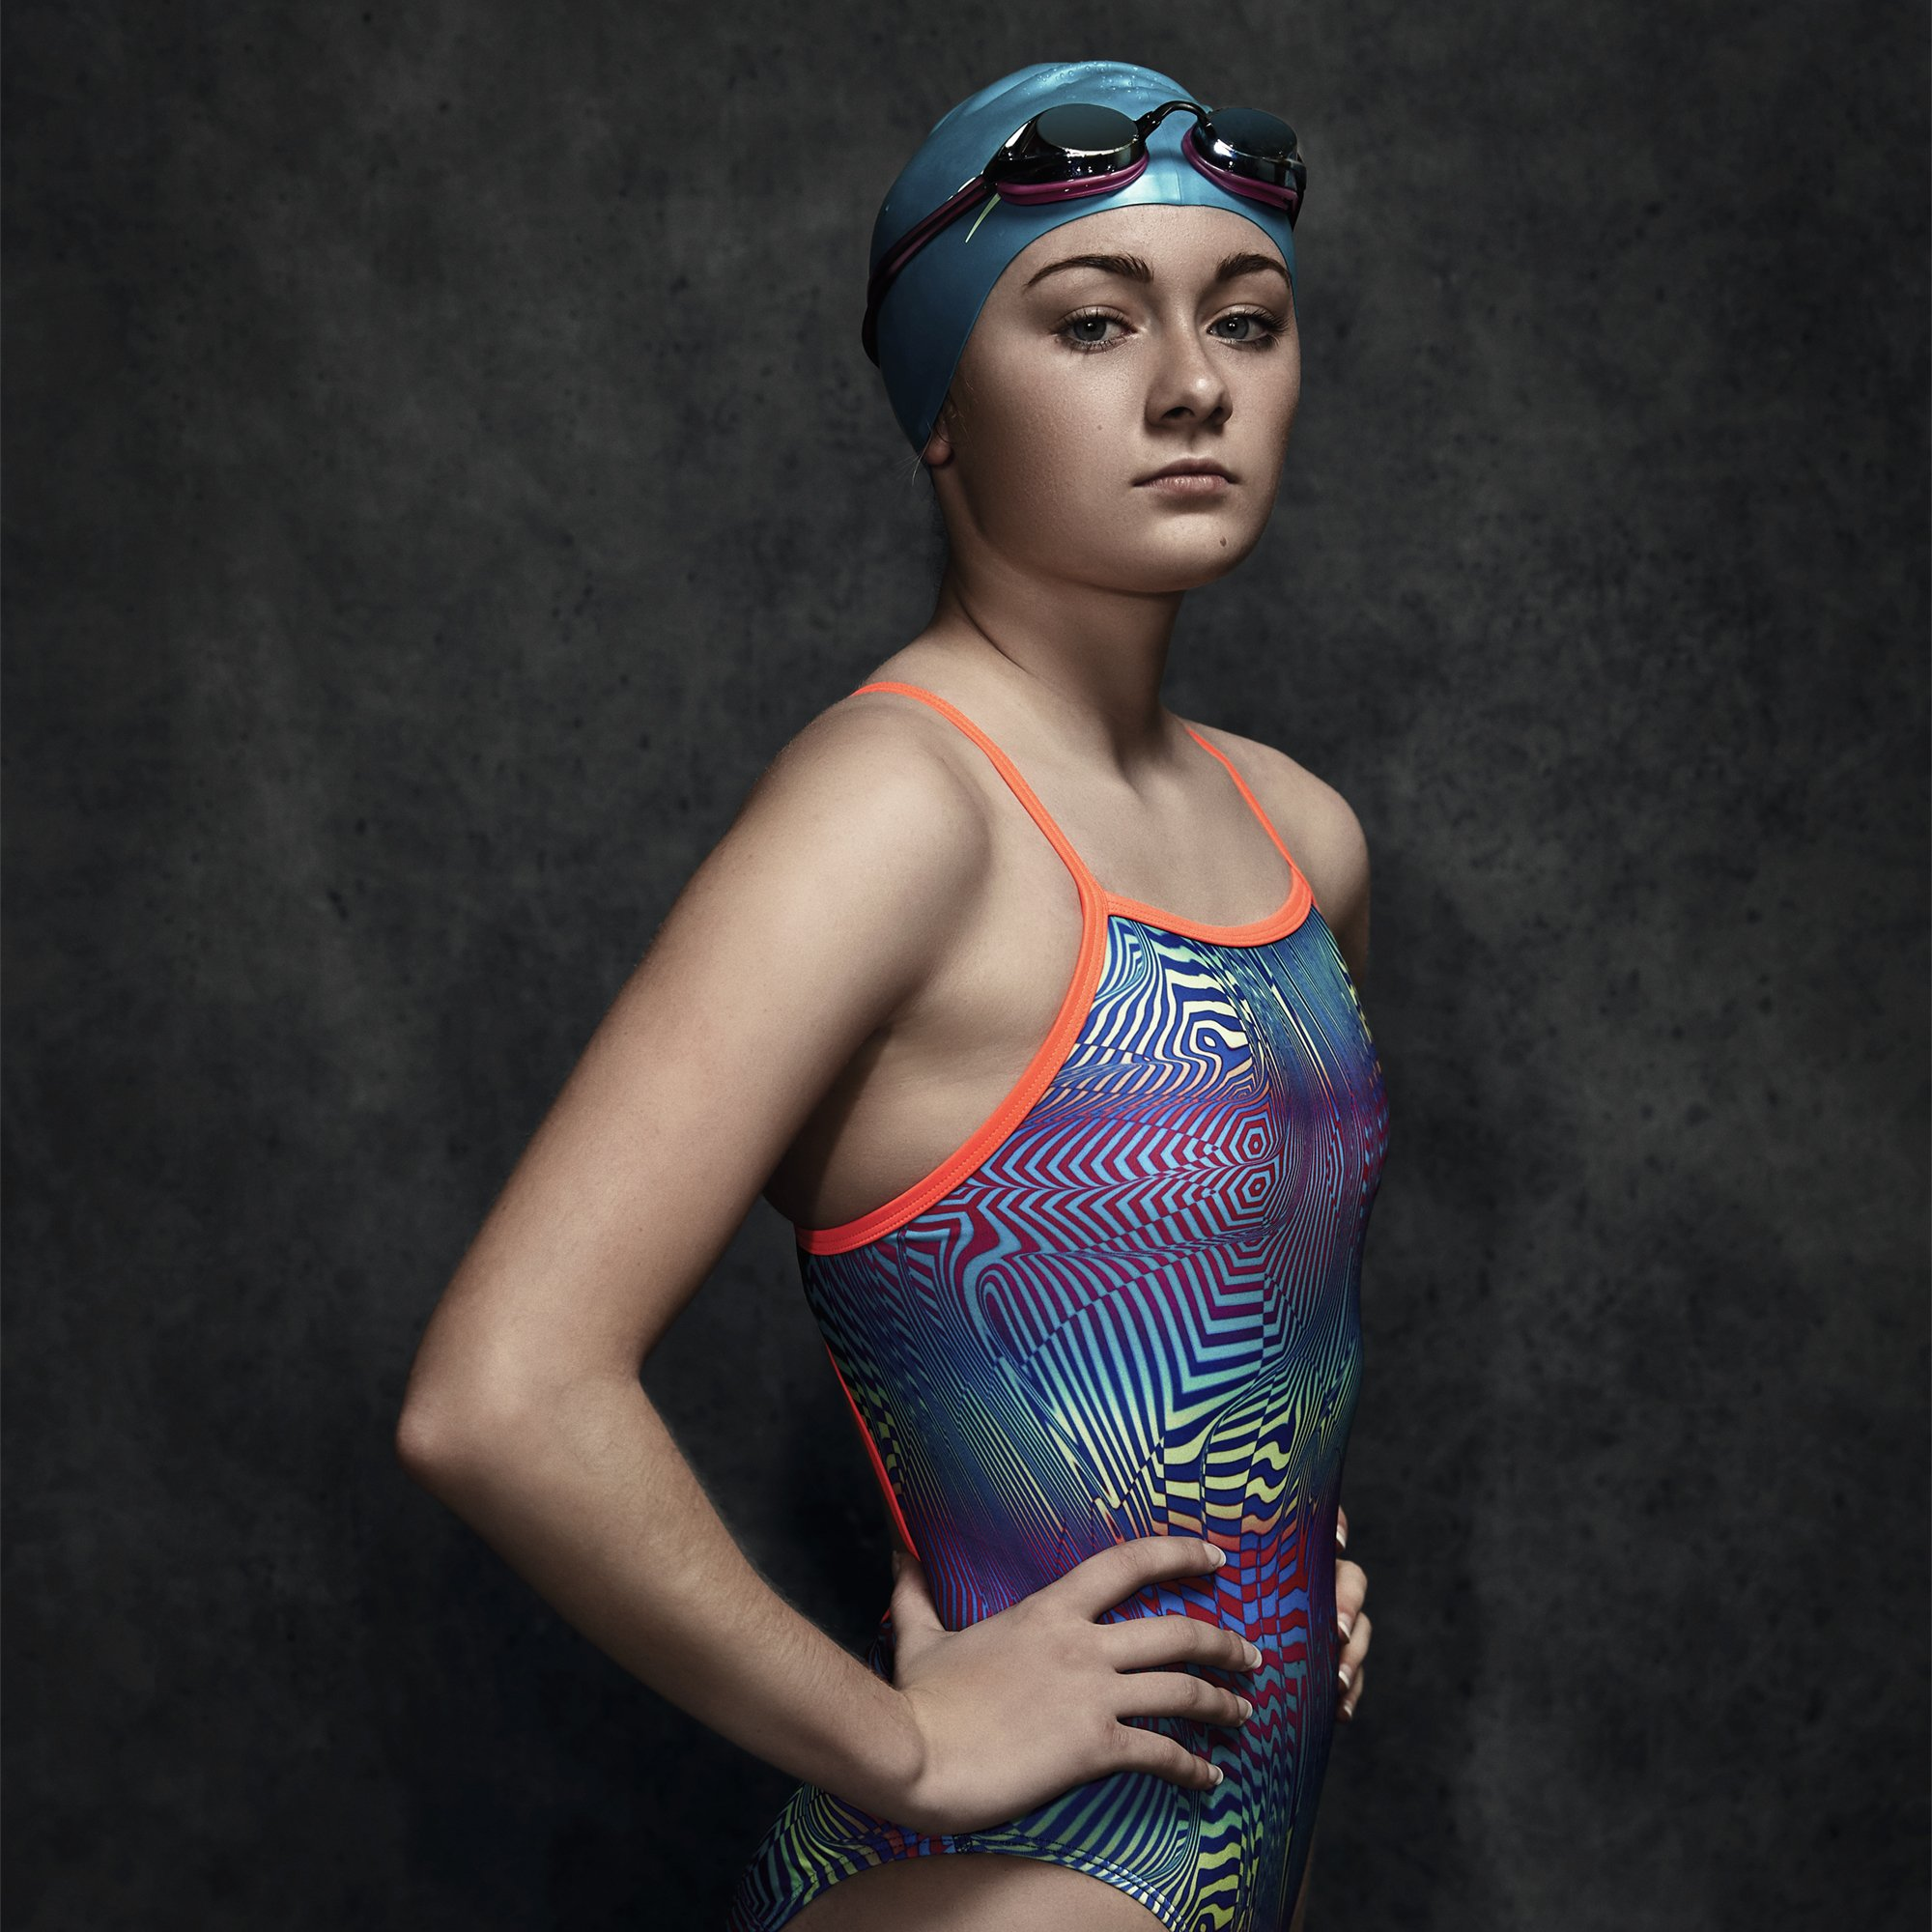 1b4dae87d1da5 Galleon - Speedo Women's Pro Lt Flipturns Propel Back One Piece Swimsuit,  Pink/Orange/Zebrotrastic, Size 10/36